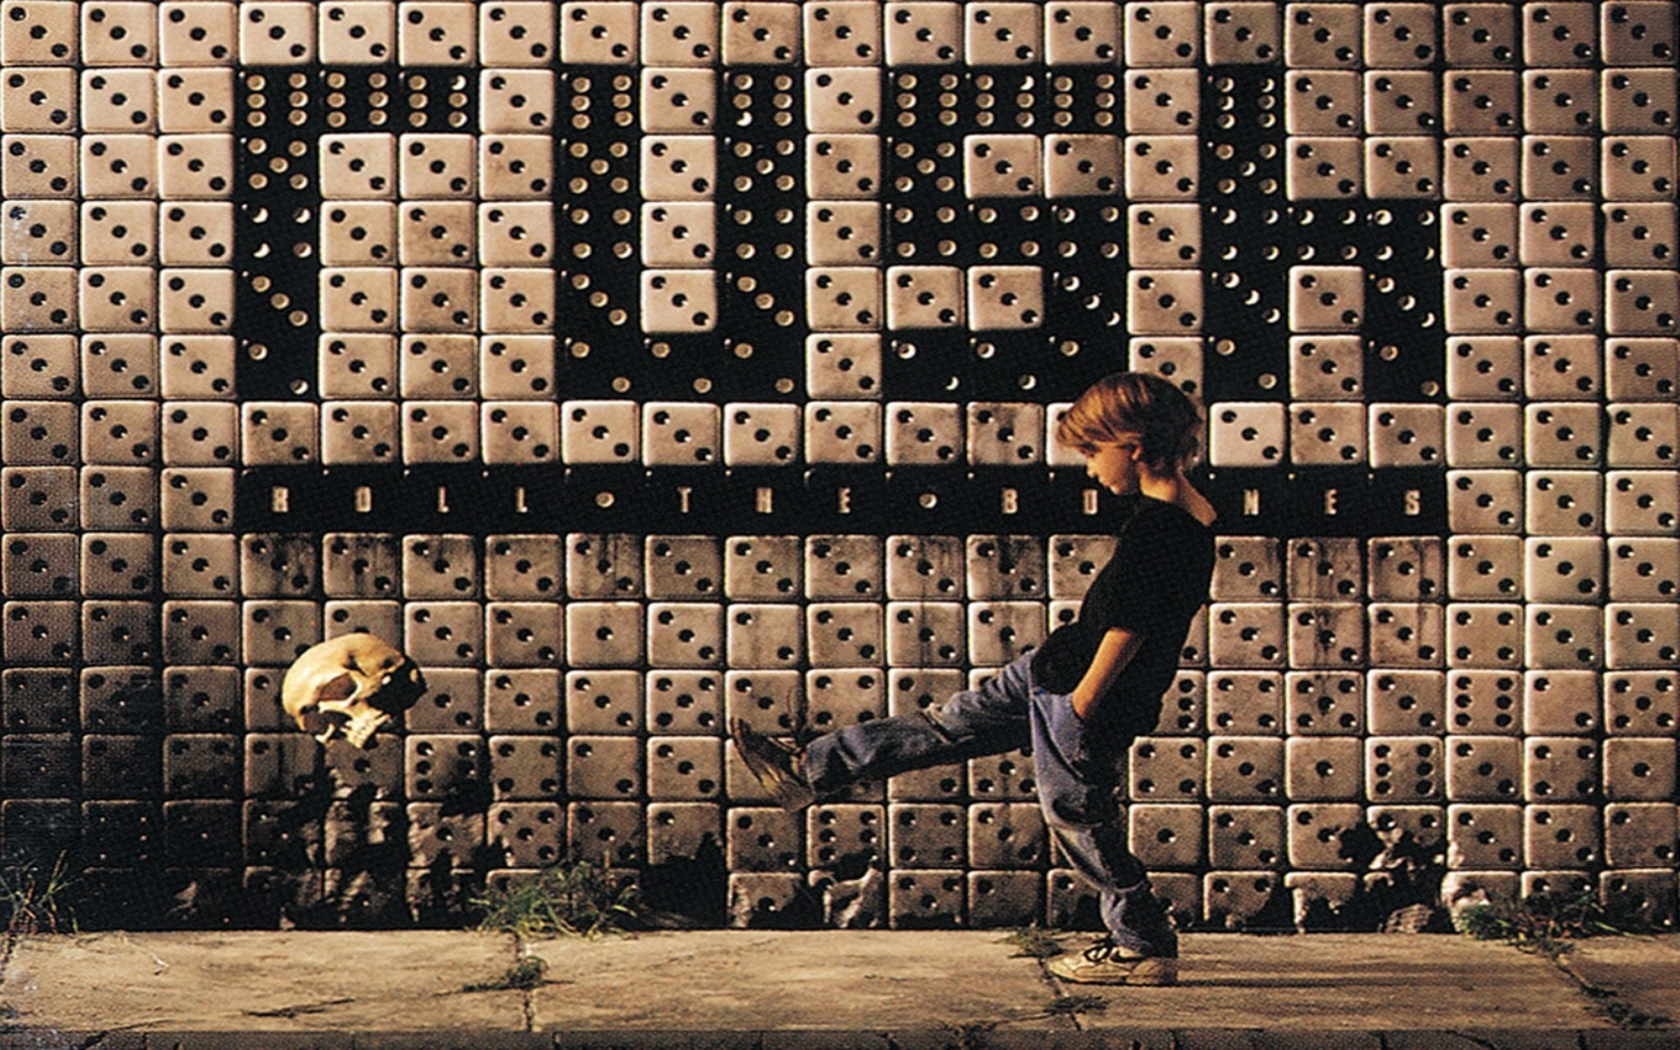 Download Rush Music Wallpaper 1680x1050 Wallpoper 417513 1680x1050